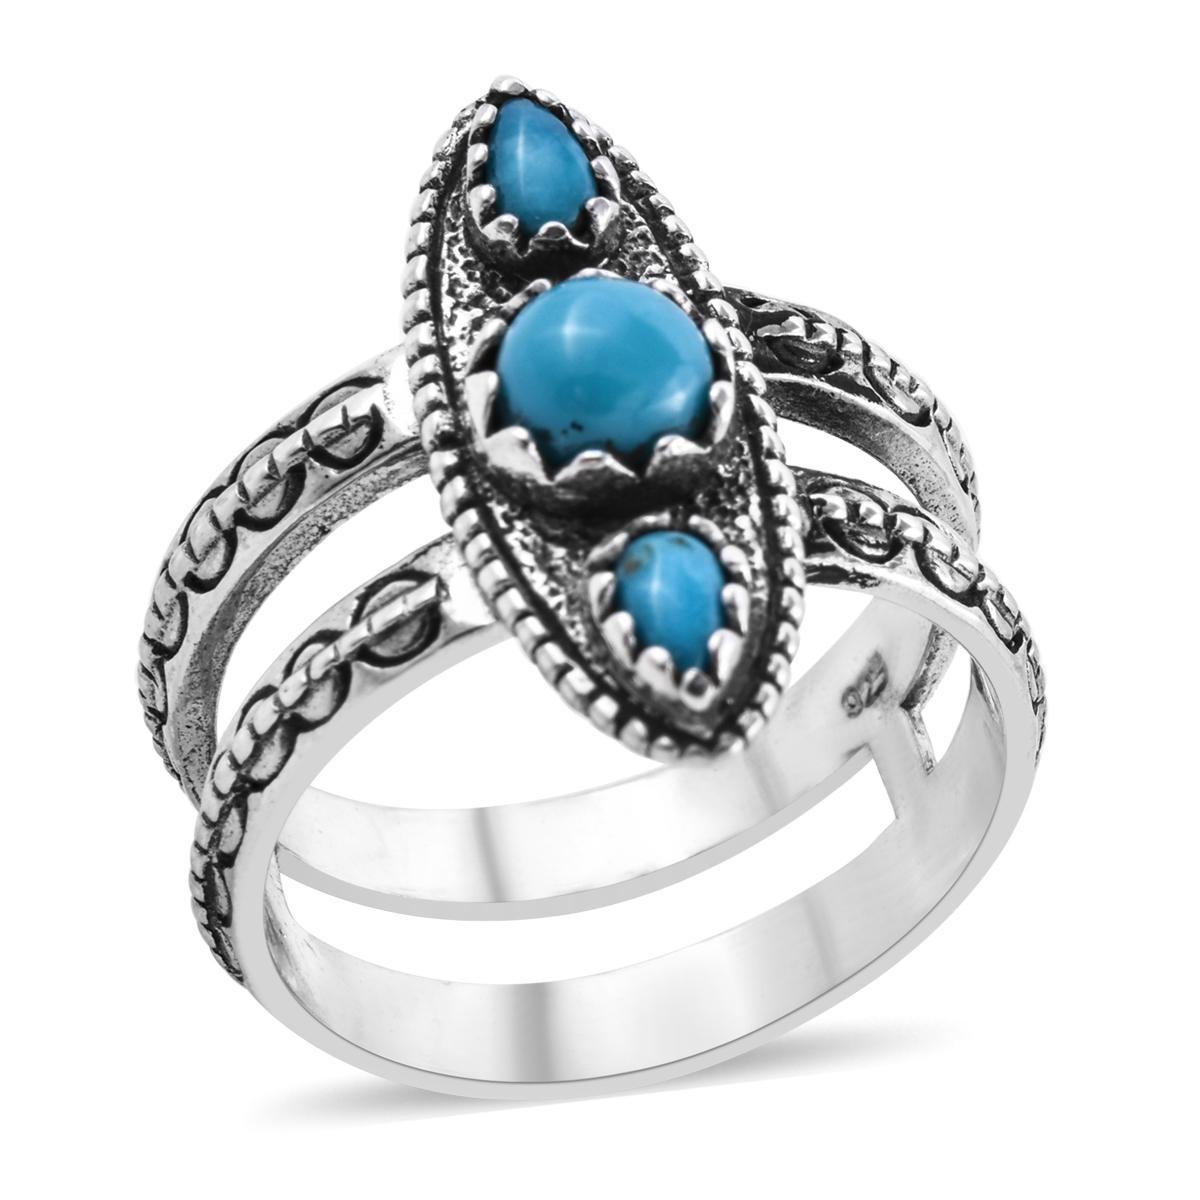 f878ecdbf16c4e Bali Legacy Collection Arizona Sleeping Beauty Turquoise Sterling Silver  Split Band Ring (Size 9.0) TGW 1.06 cts. | Arizona-Sleeping-Beauty-Turquoise  ...